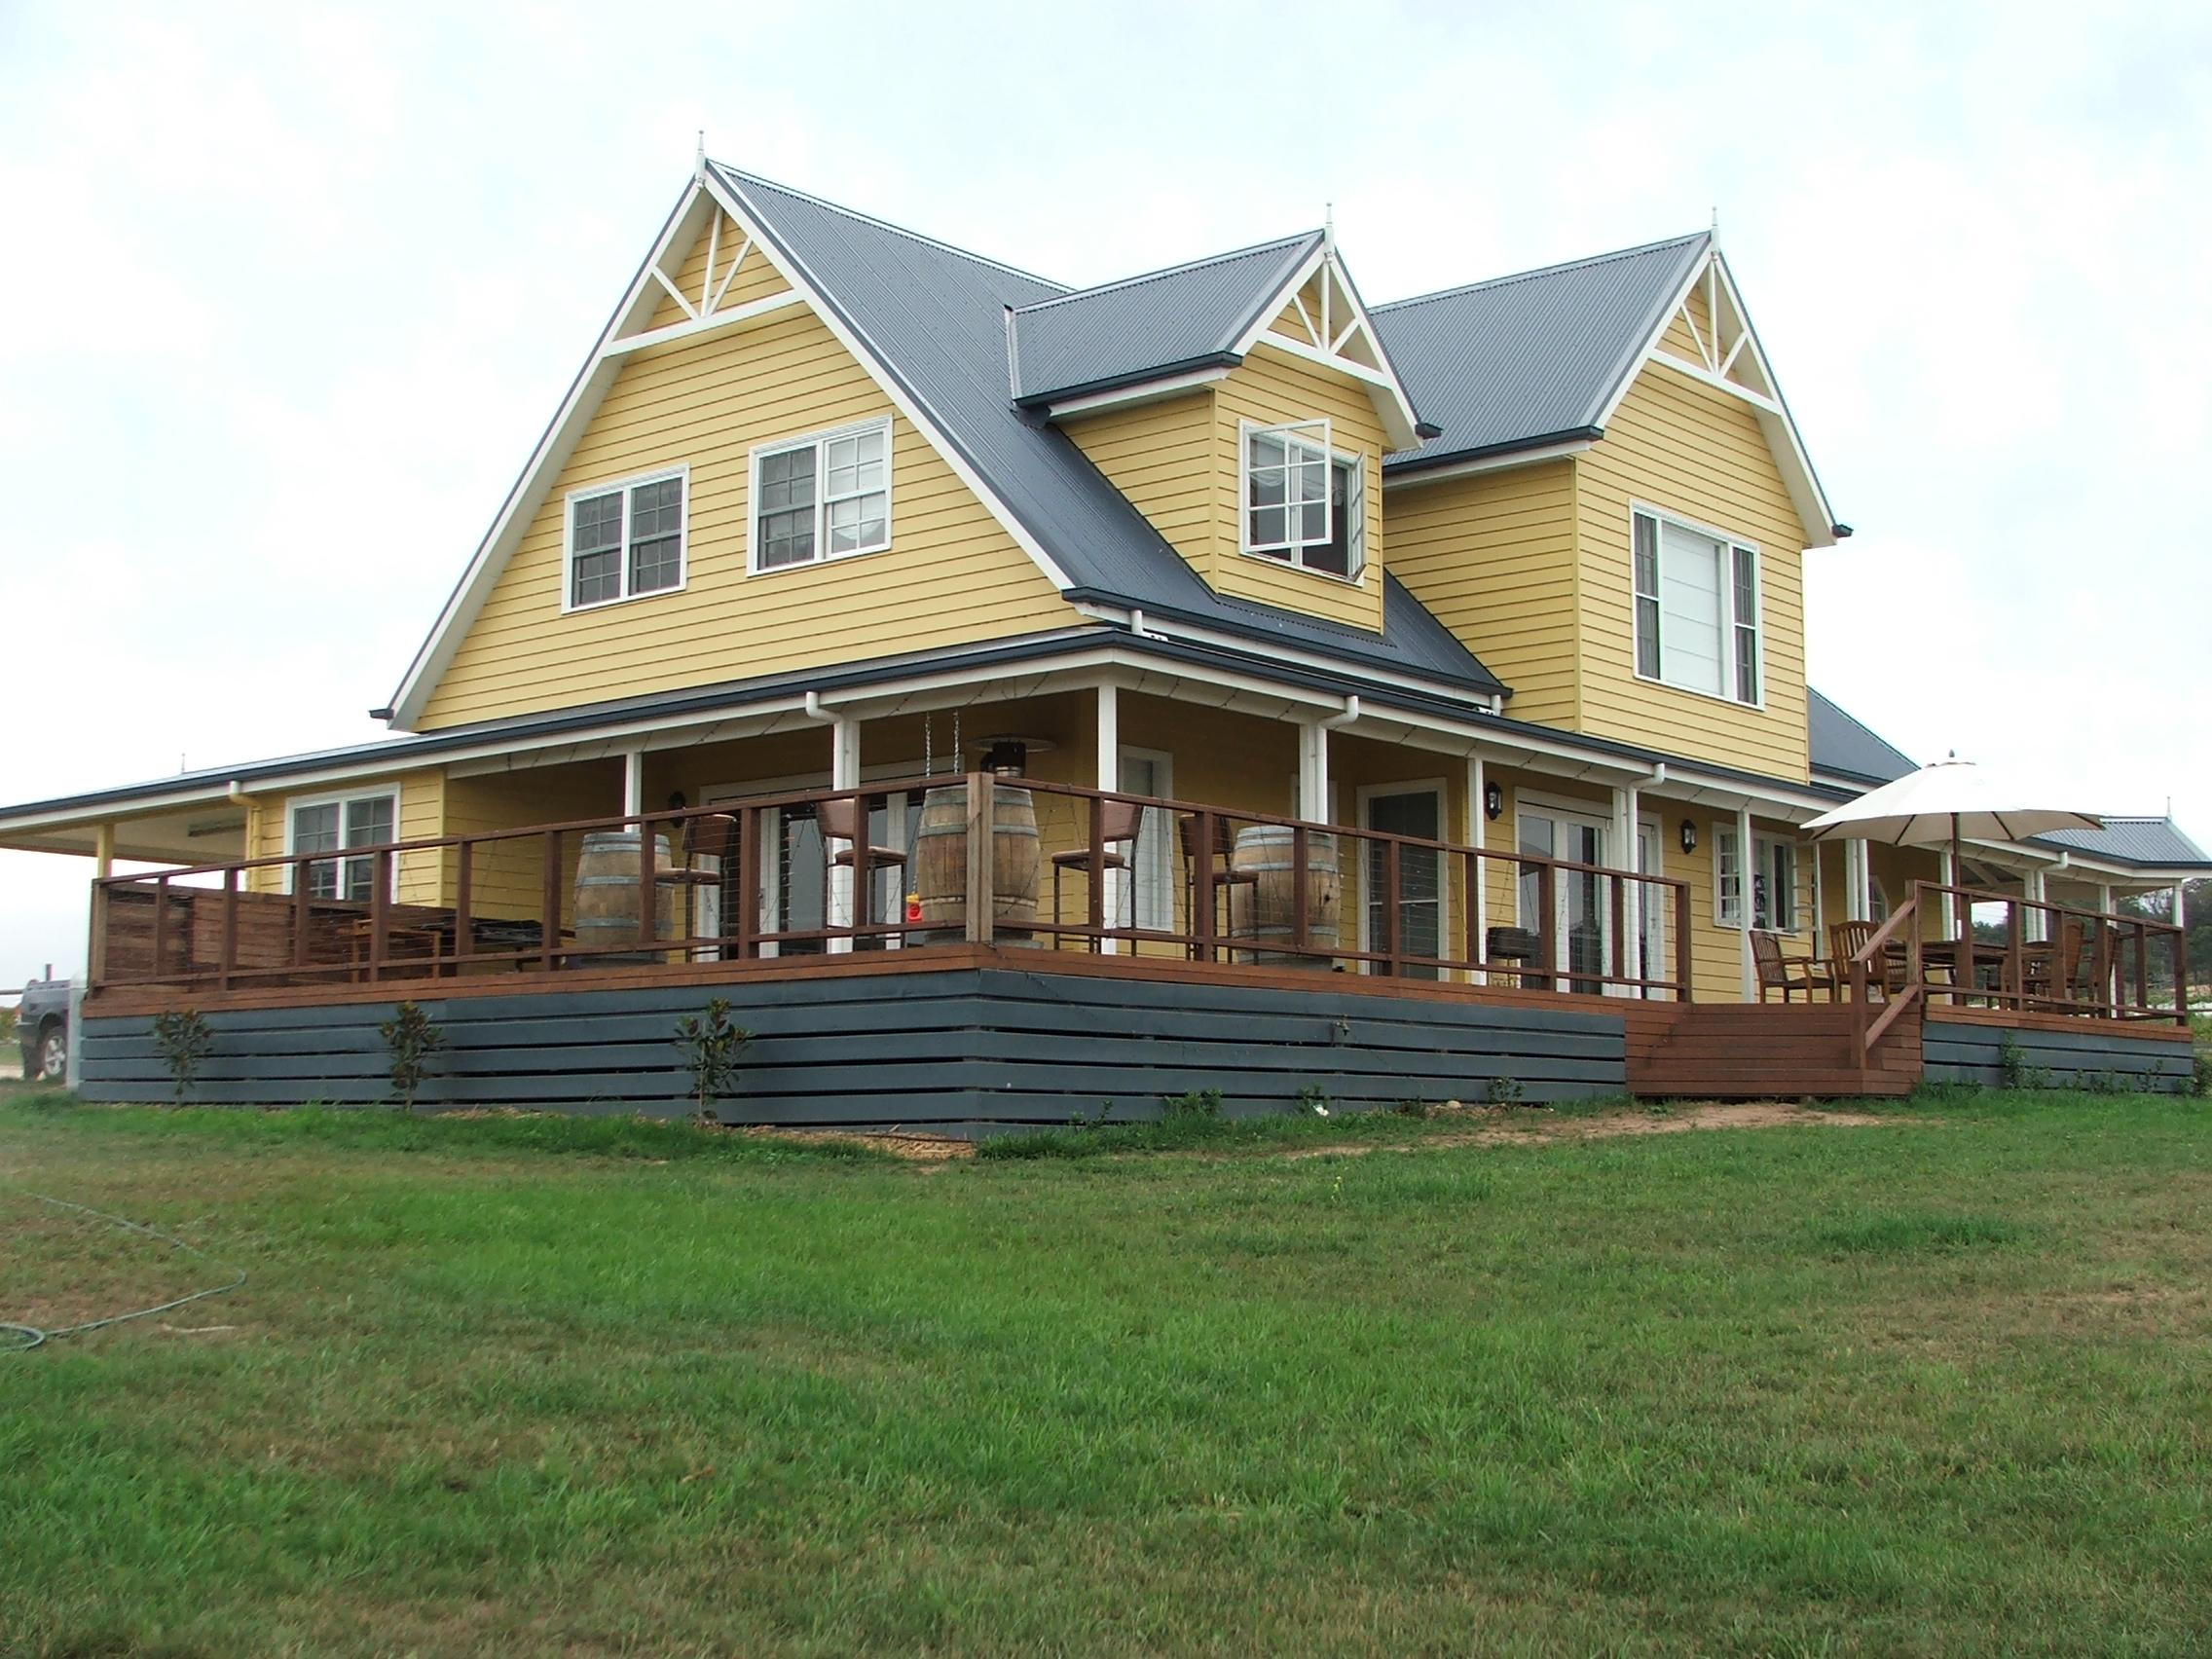 Maffra - Blue Gables Vineyard traditional country home built by Farm Houses of Australia